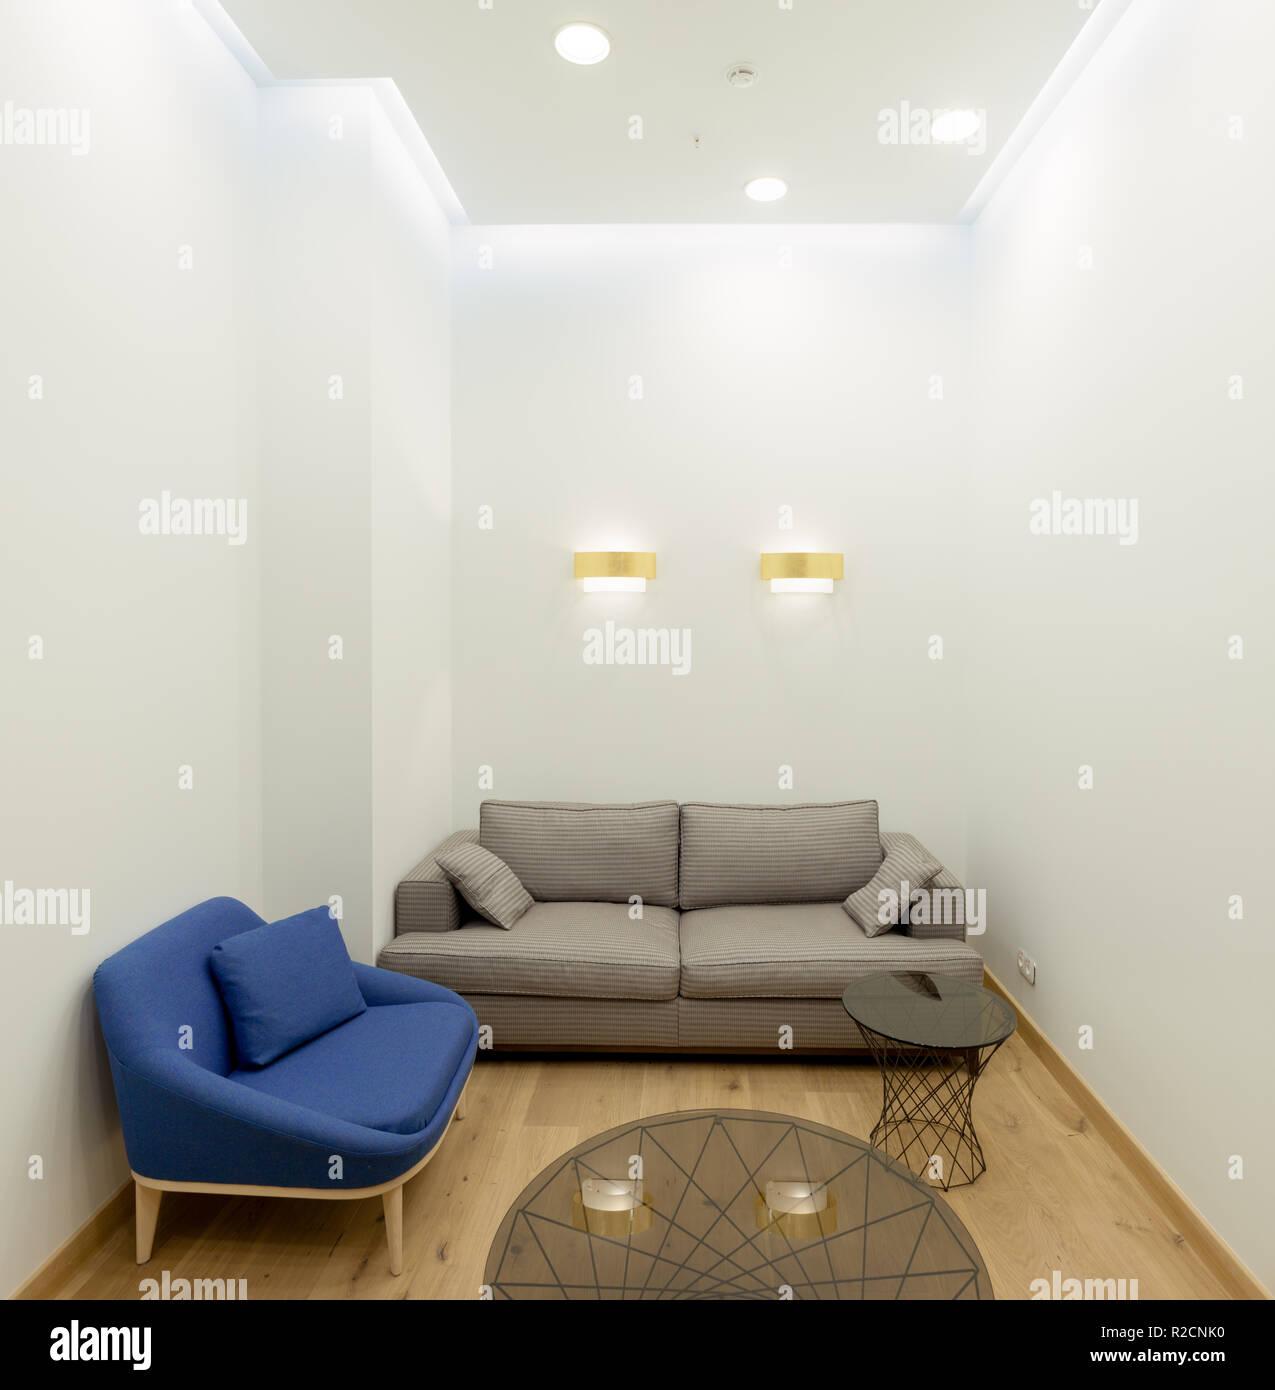 Empty Modern Office Lounge Room Interior.